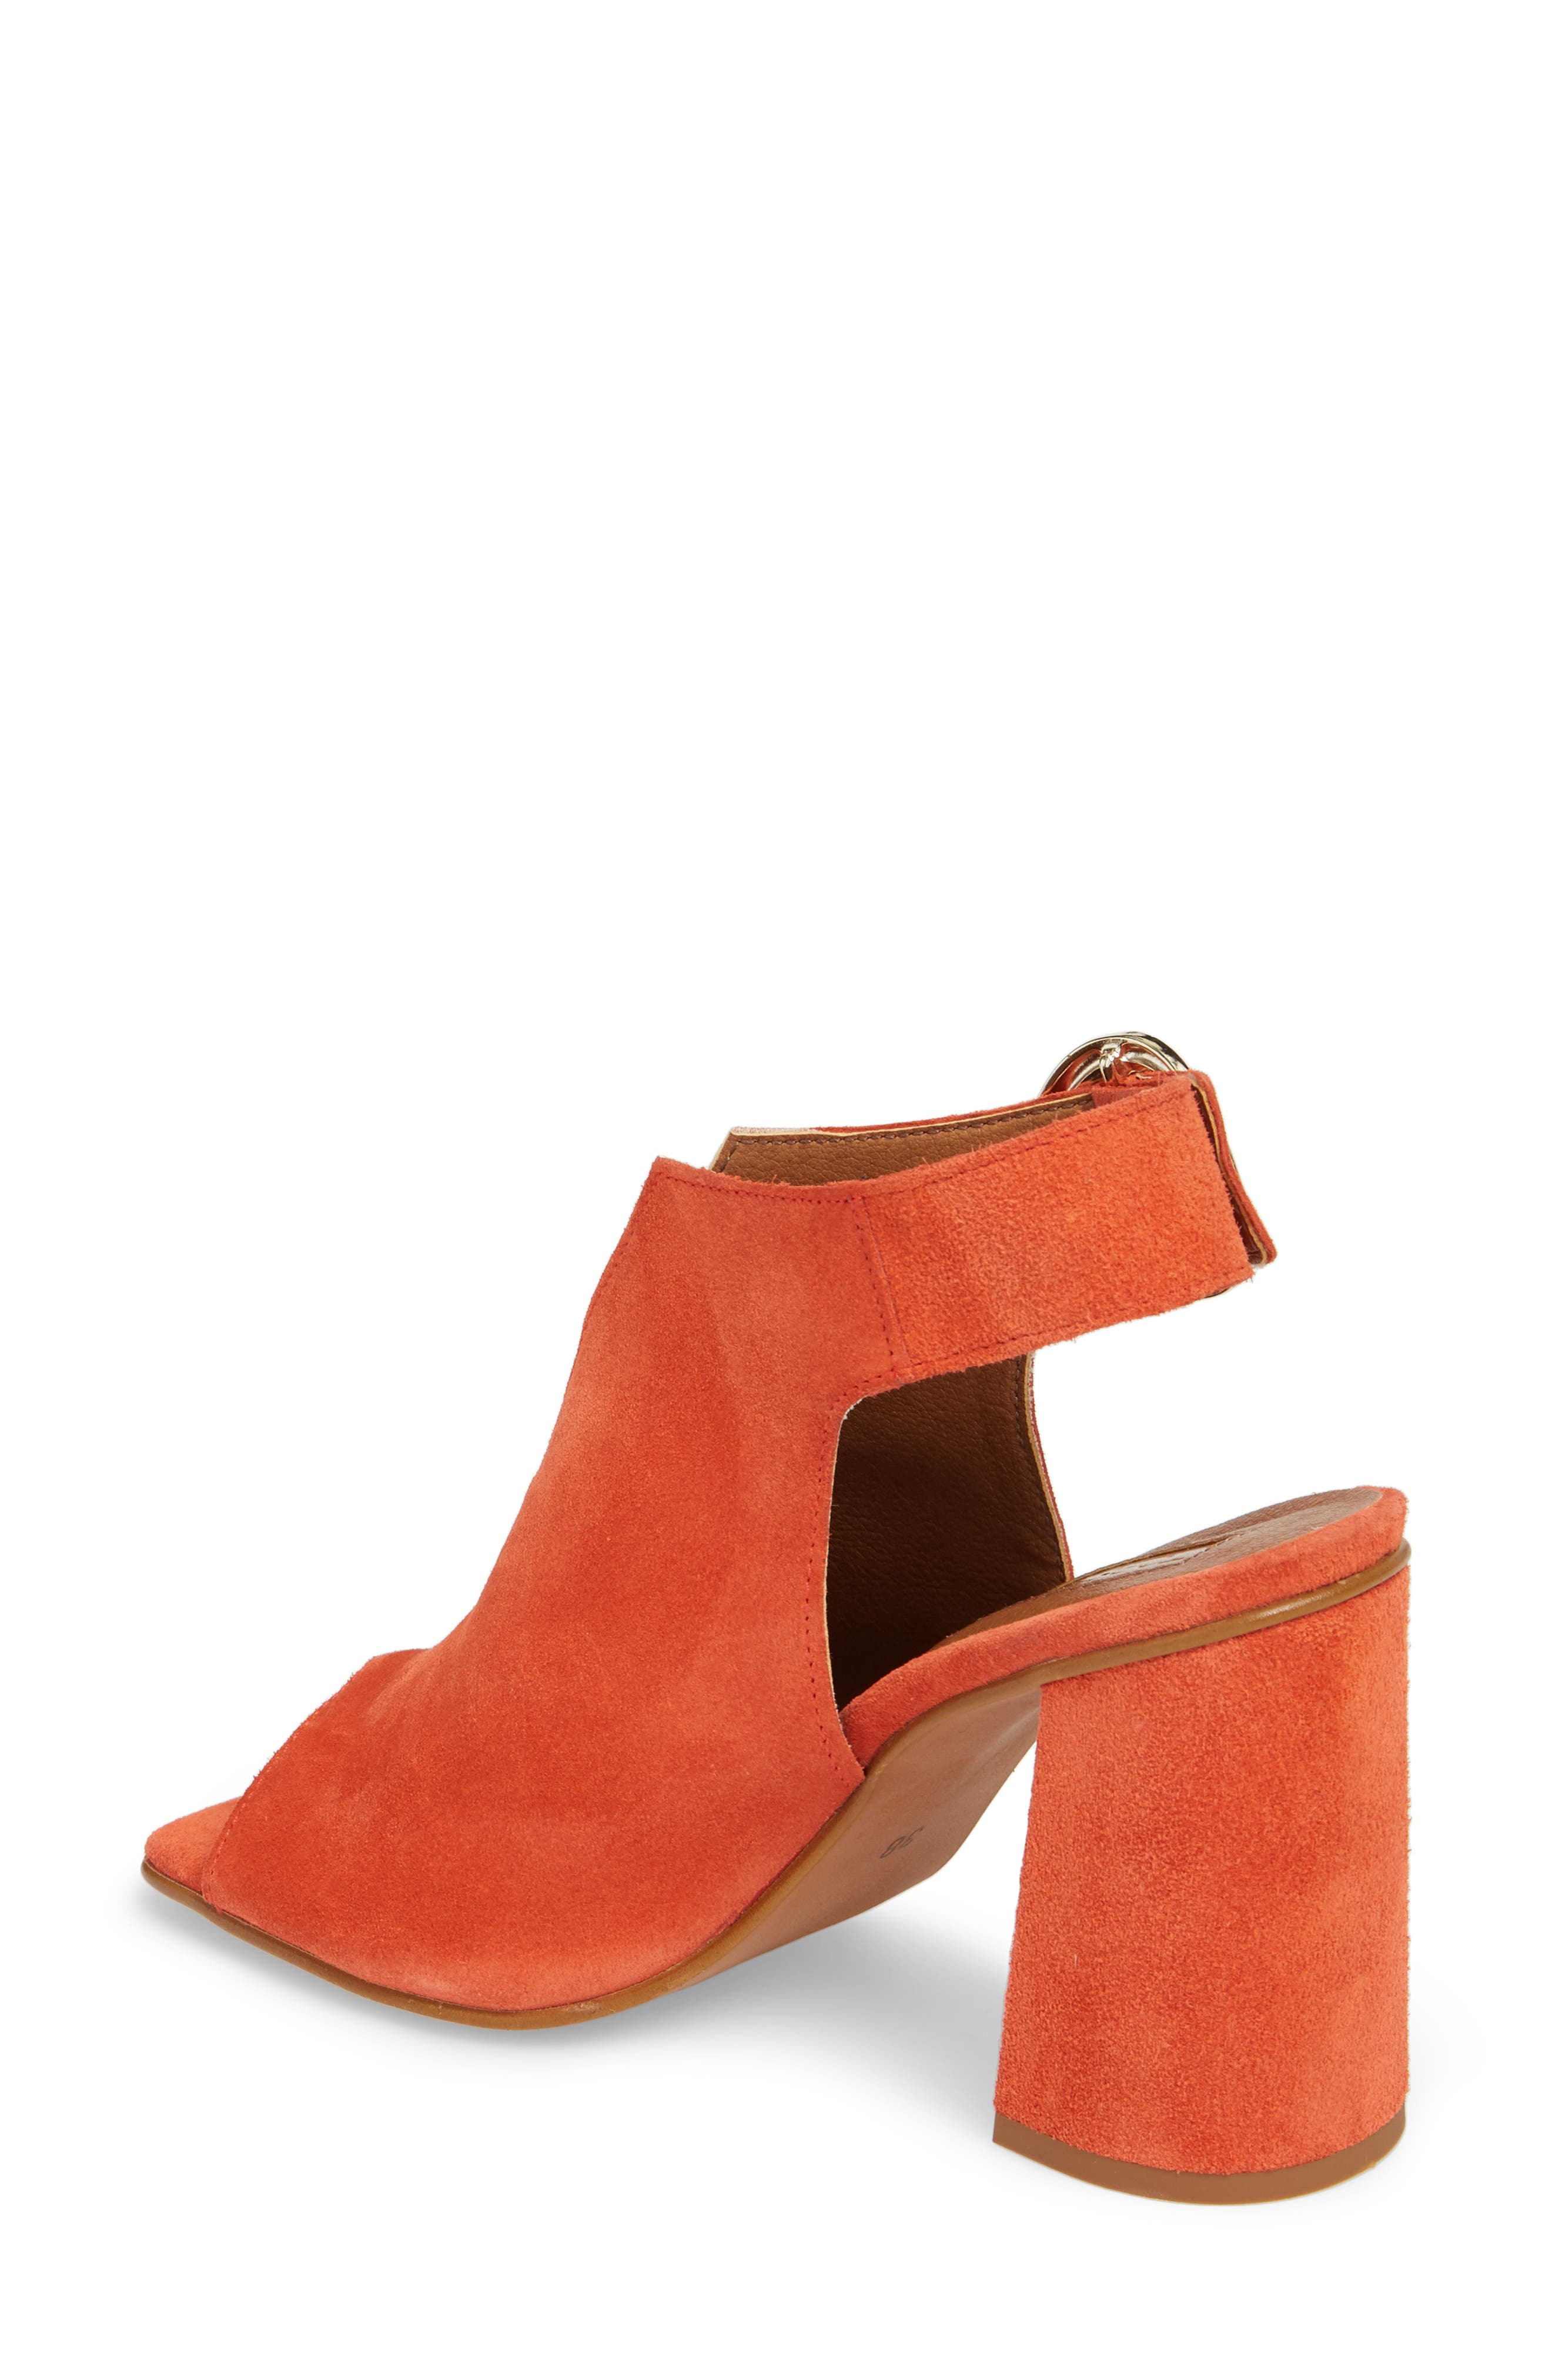 Nika Flared Heel Slingback Sandal,                             Alternate thumbnail 4, color,